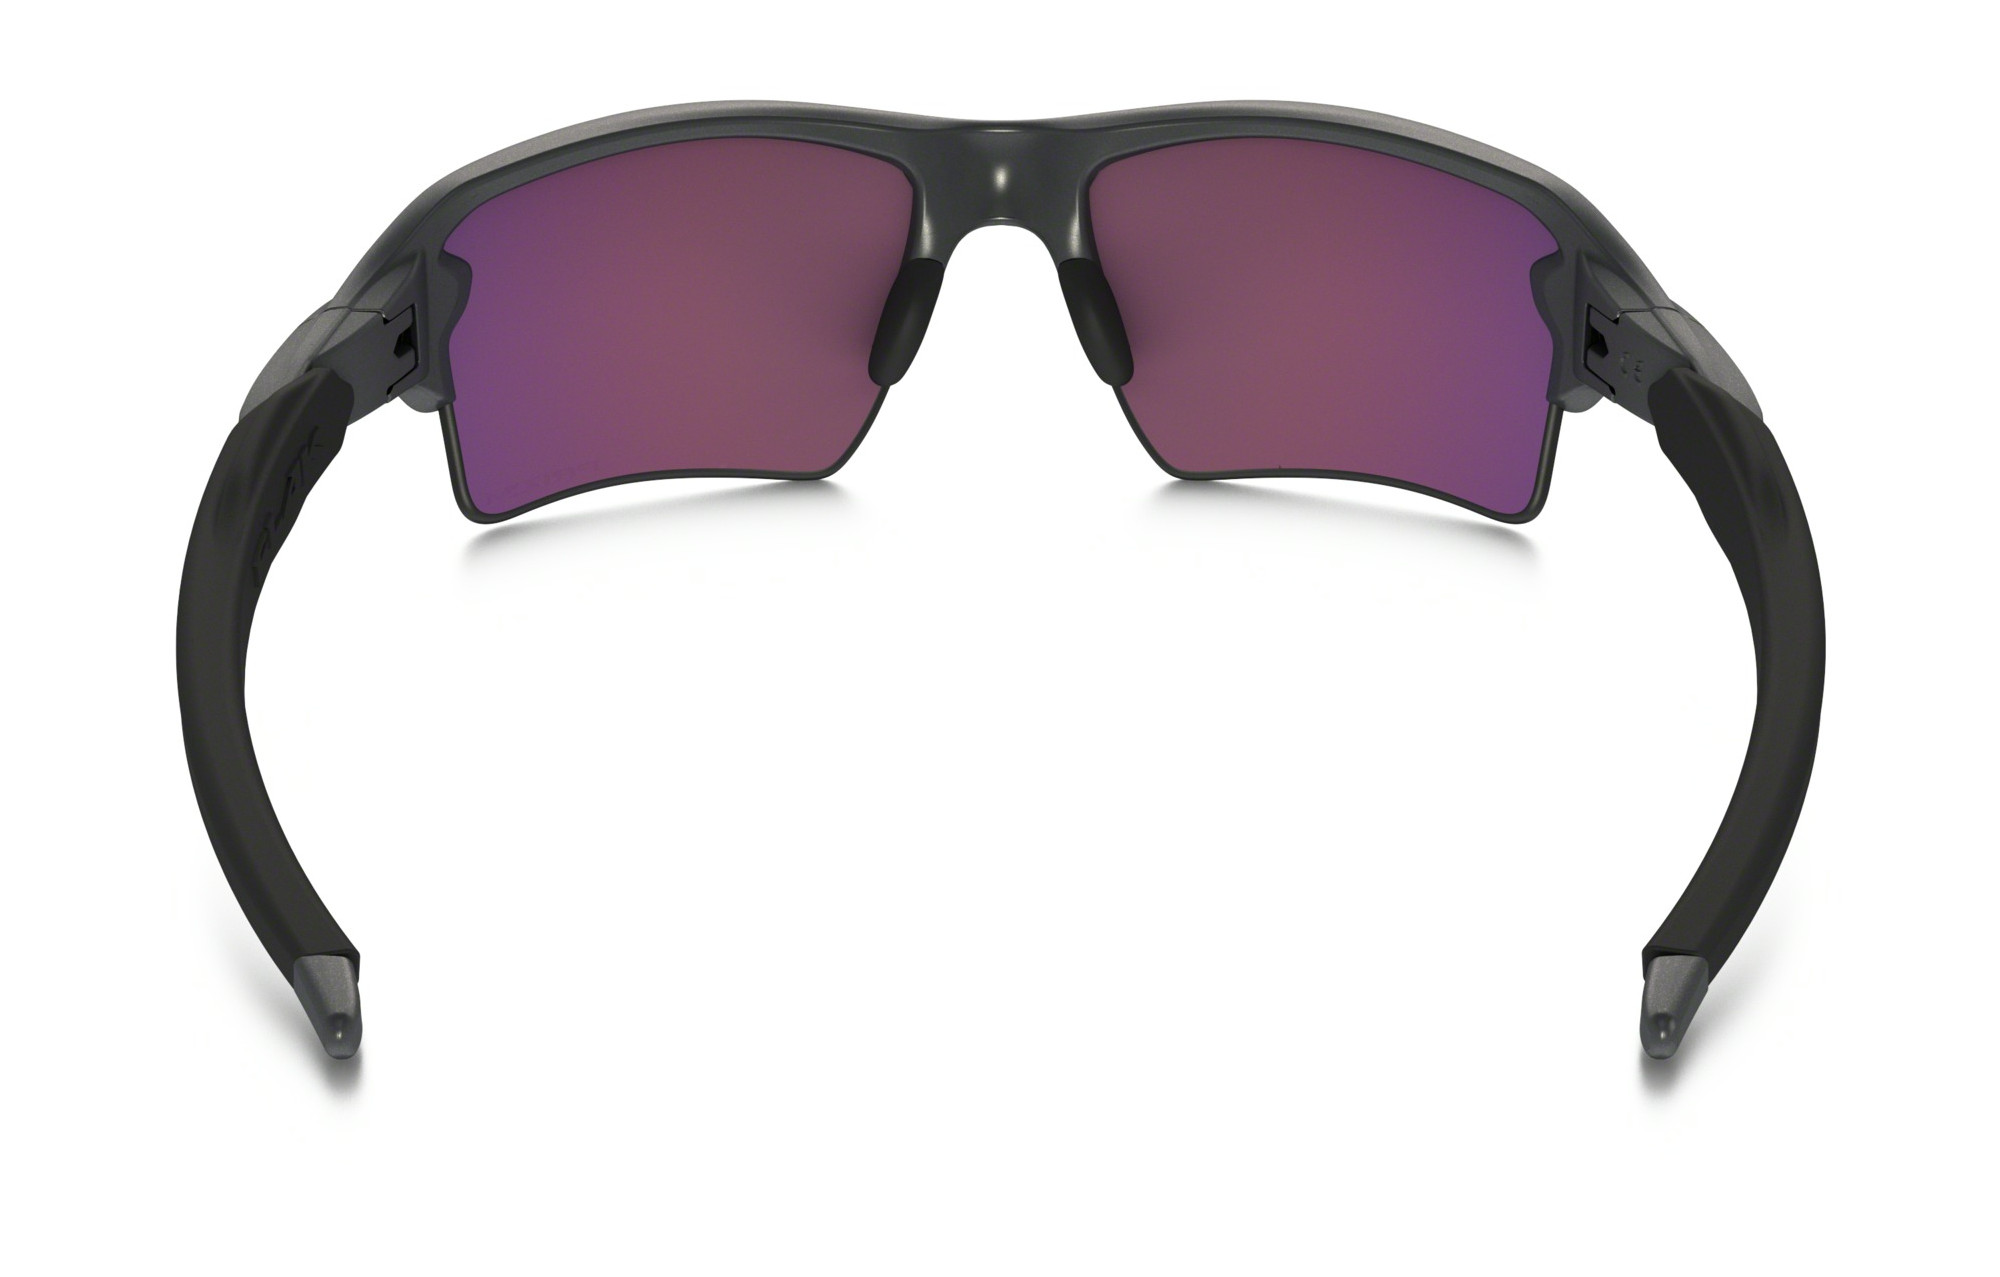 ff1bdd71d5f OAKLEY FLAK 2.0 XL STEEL COLLECTION Sunglasses Grey - Purple Iridium Prizm  Road Ref OO9188-